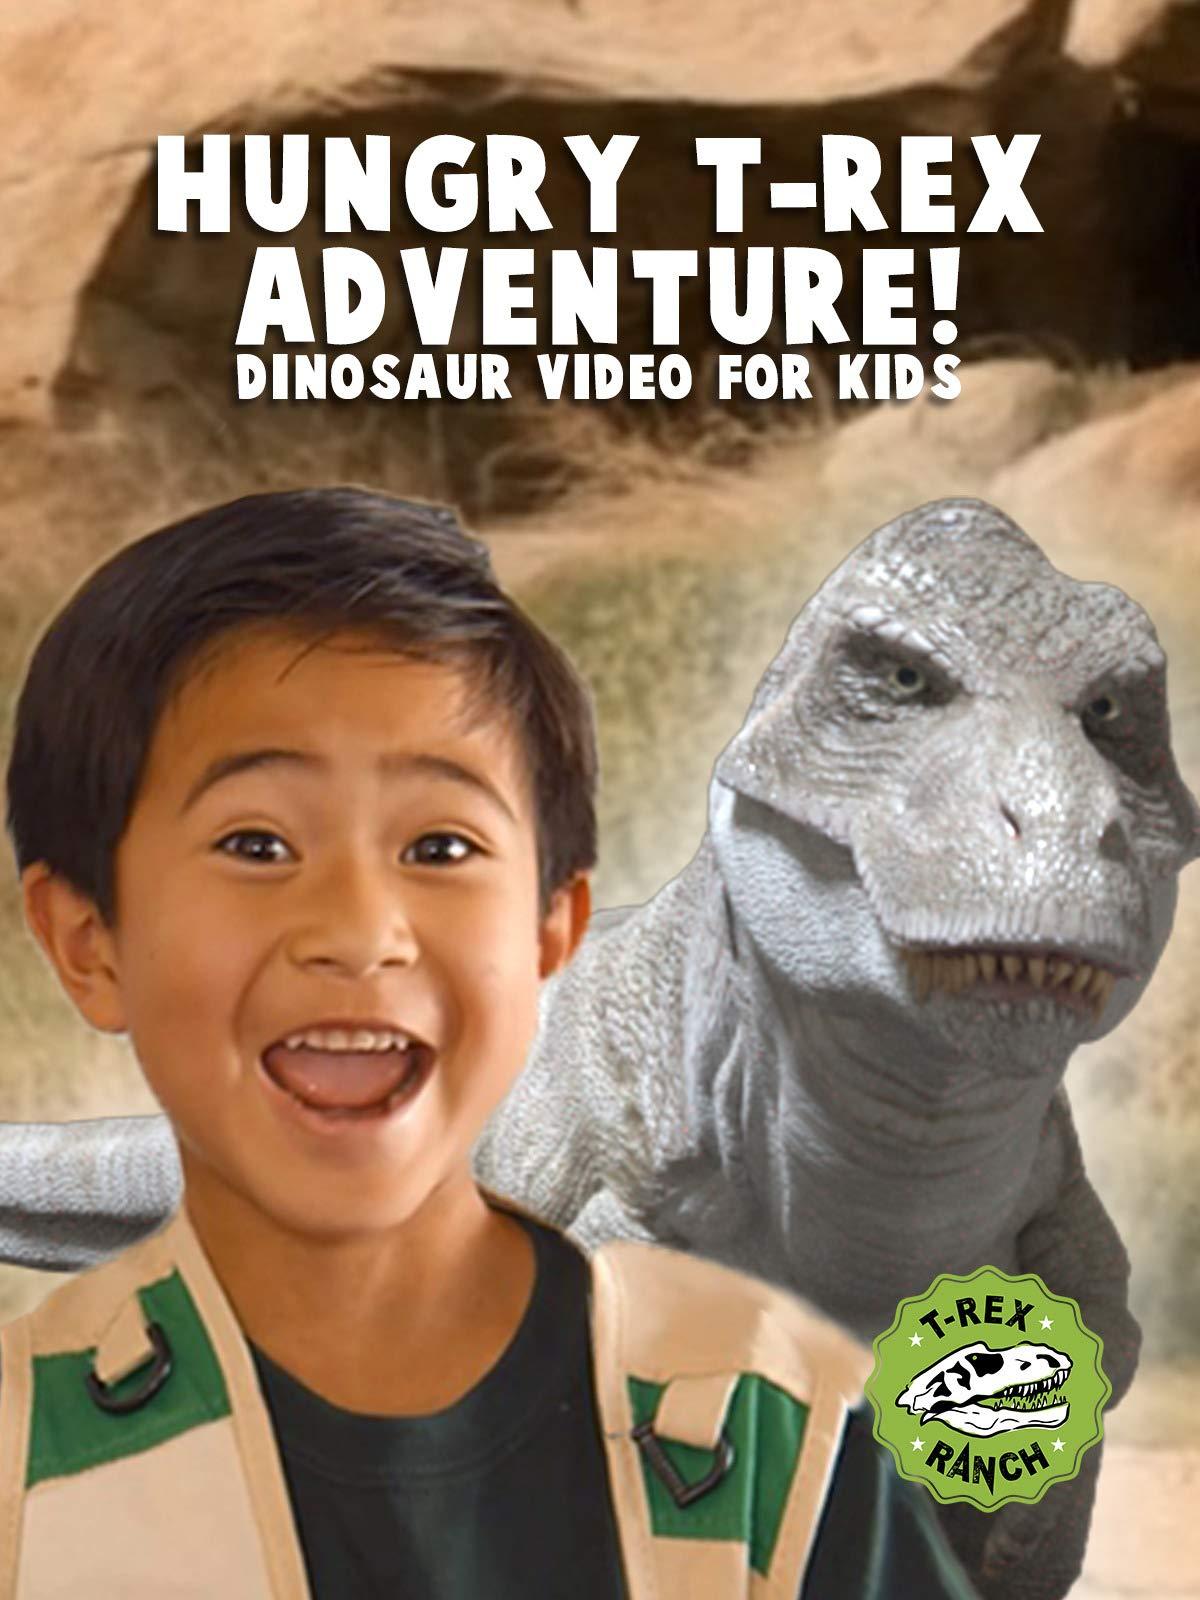 Hungry T-Rex Adventure! Dinosaur Video for kids - T-Rex Ranch